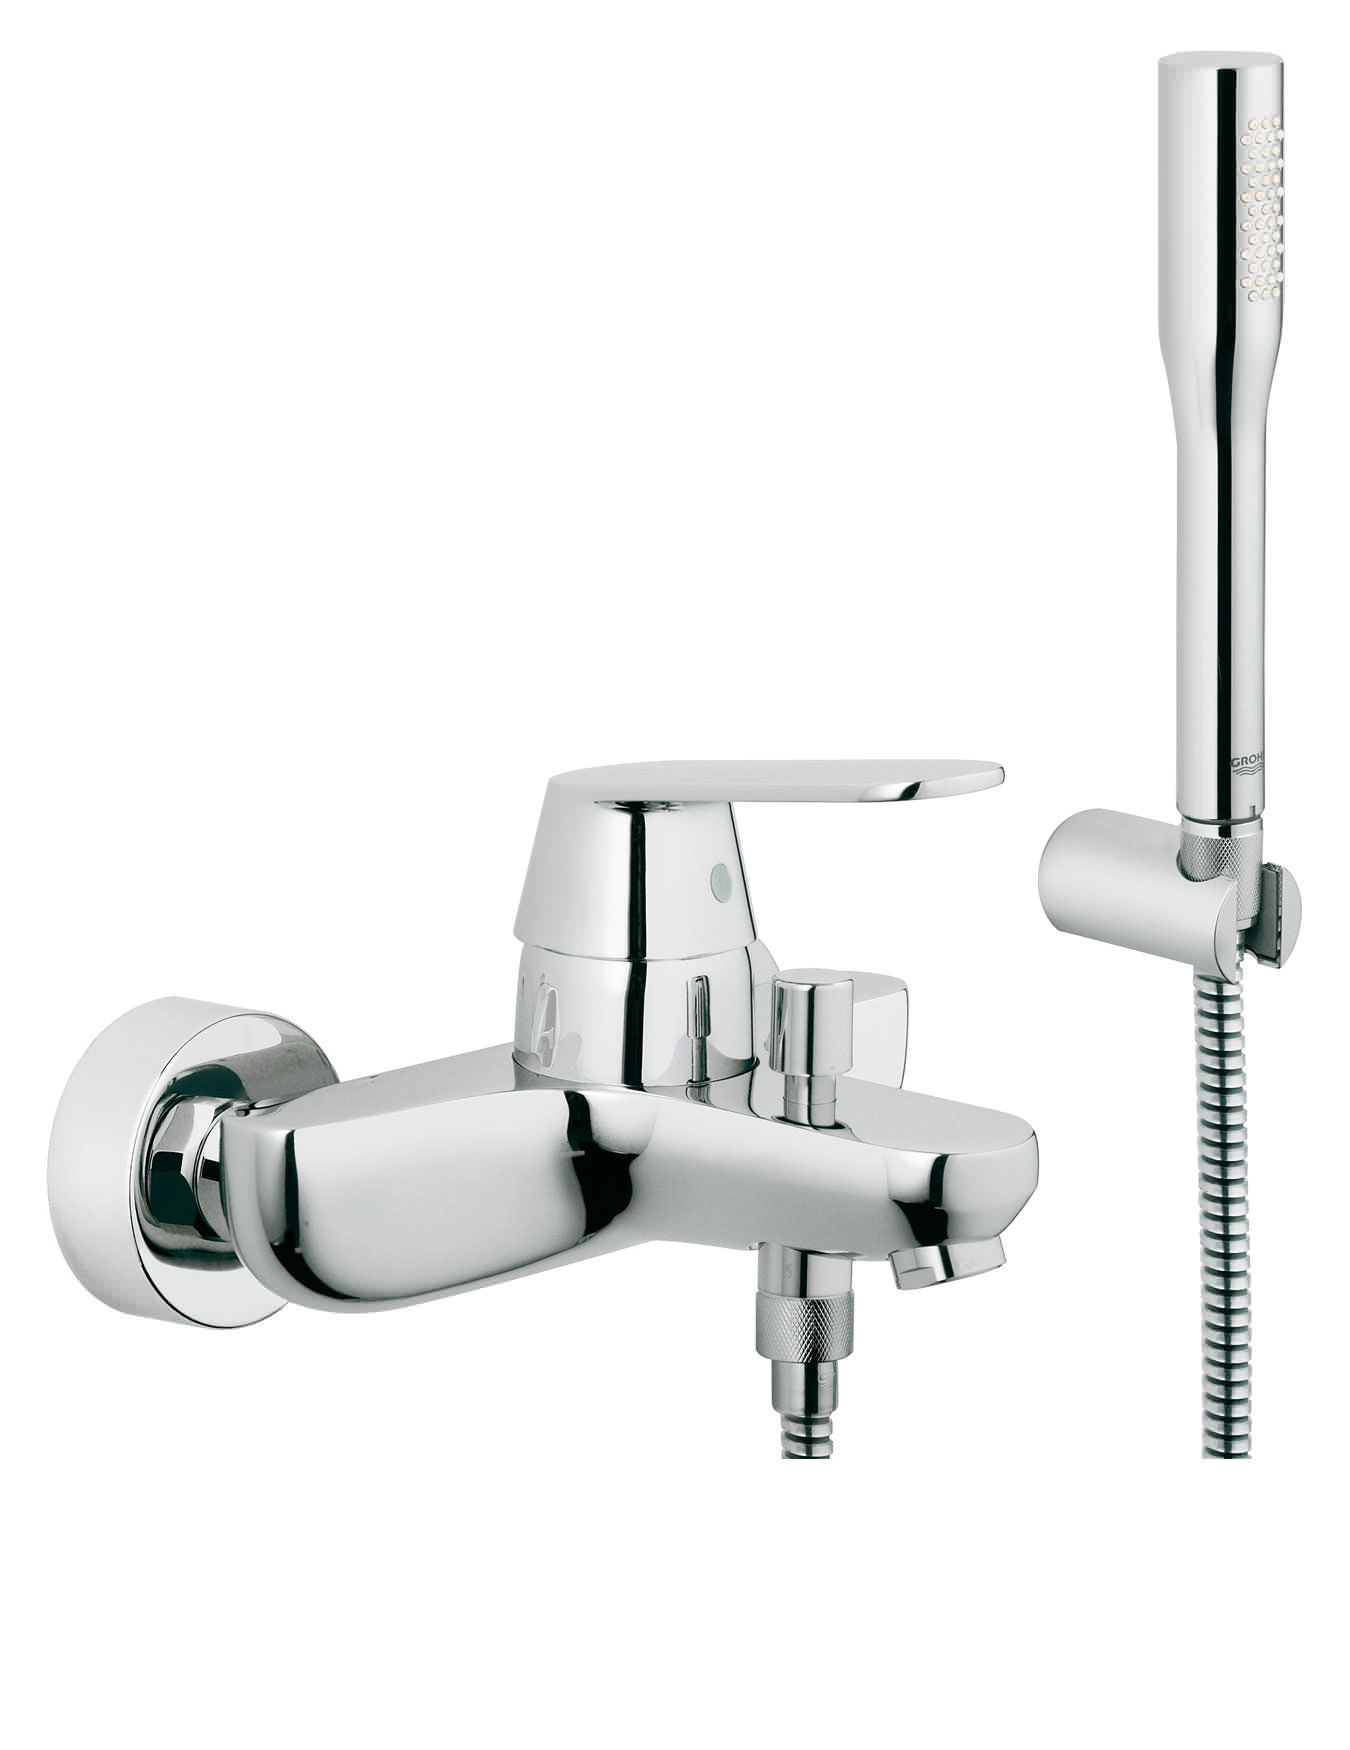 Eurosmart Cosmopolitan Wall Mounted Bath Shower Mixer With Kit